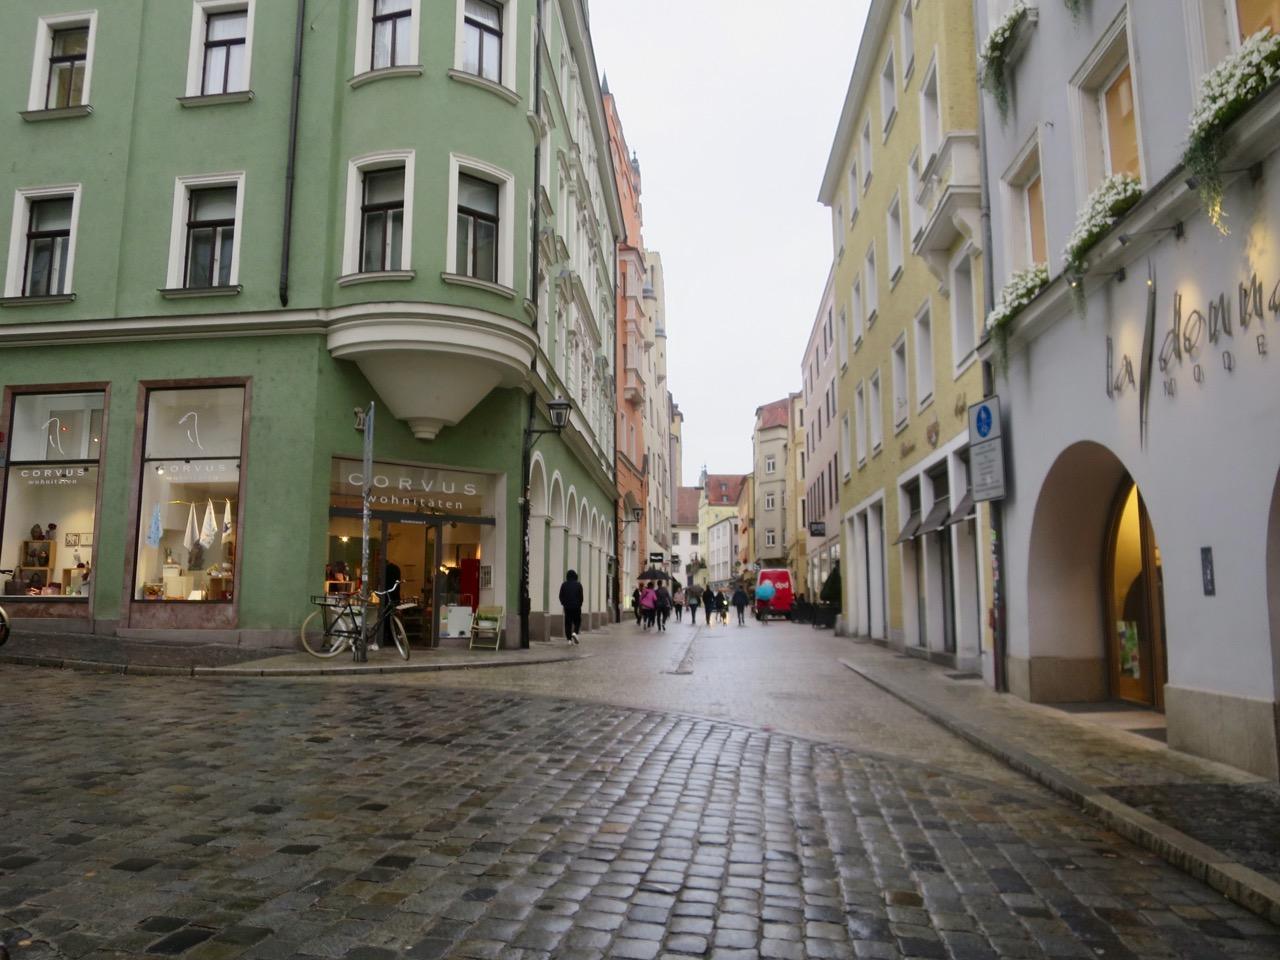 Regensburg 1 23